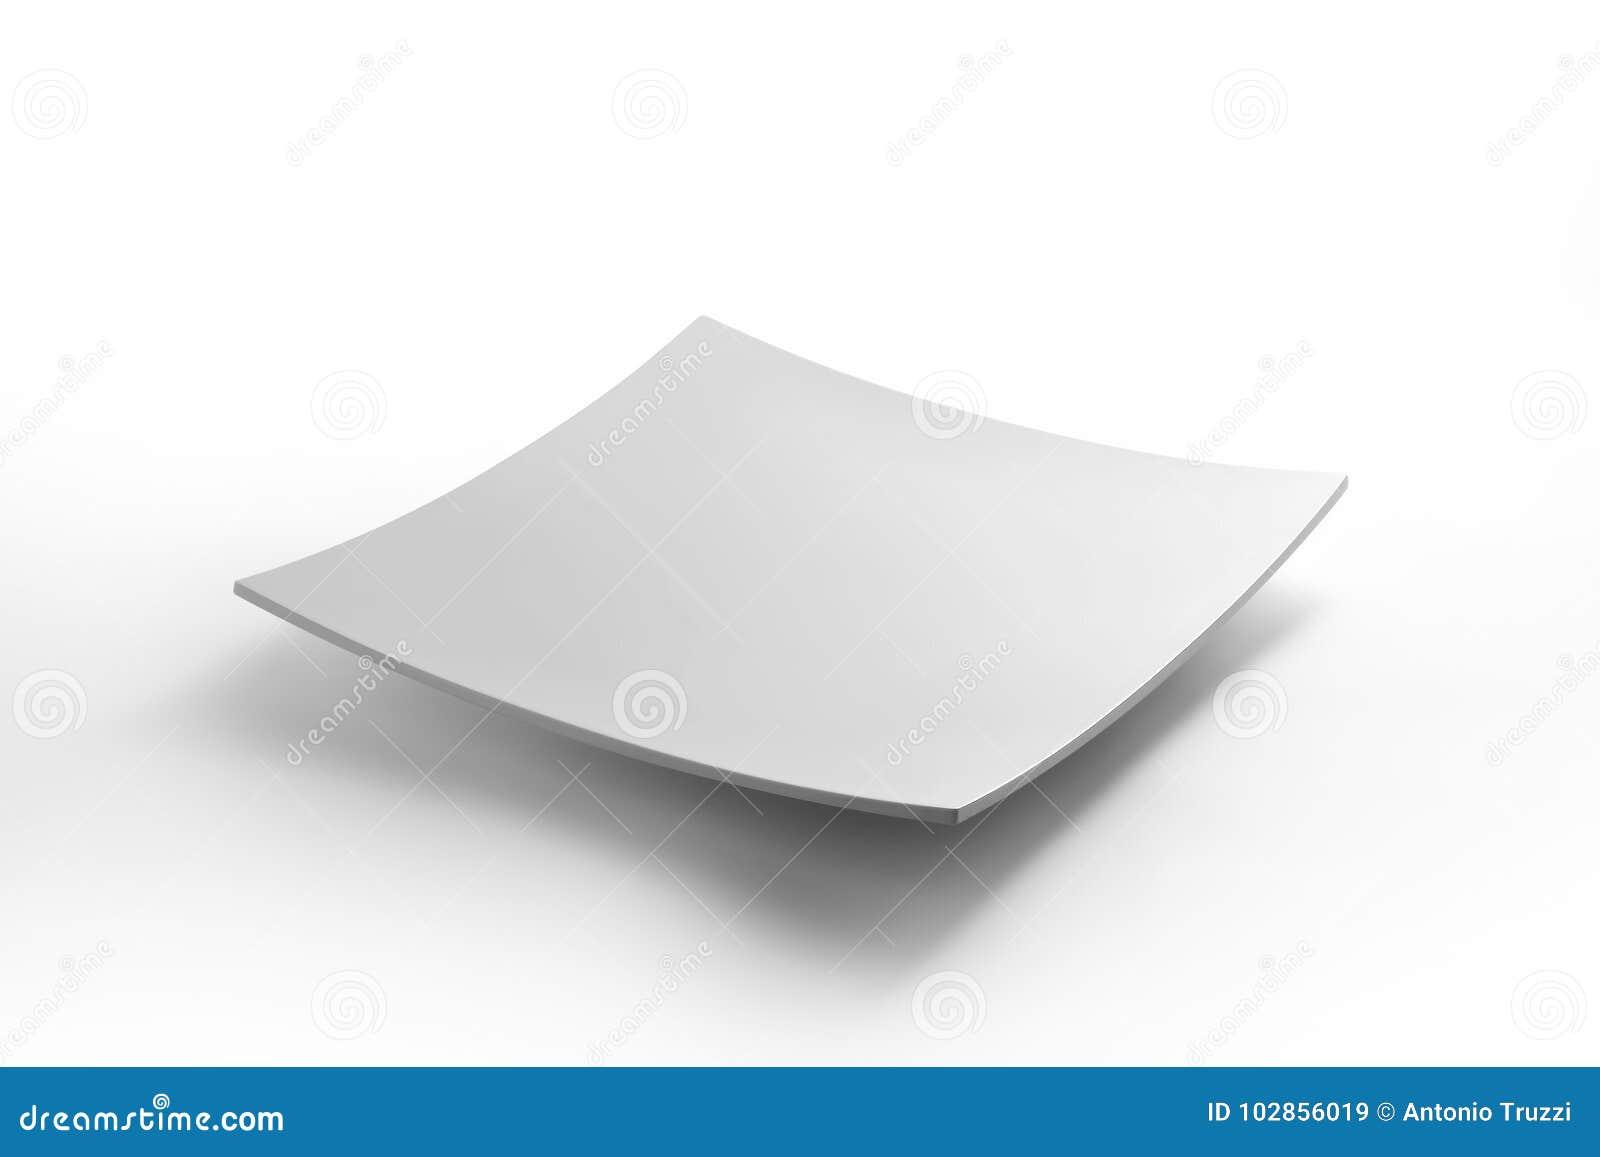 White square dish